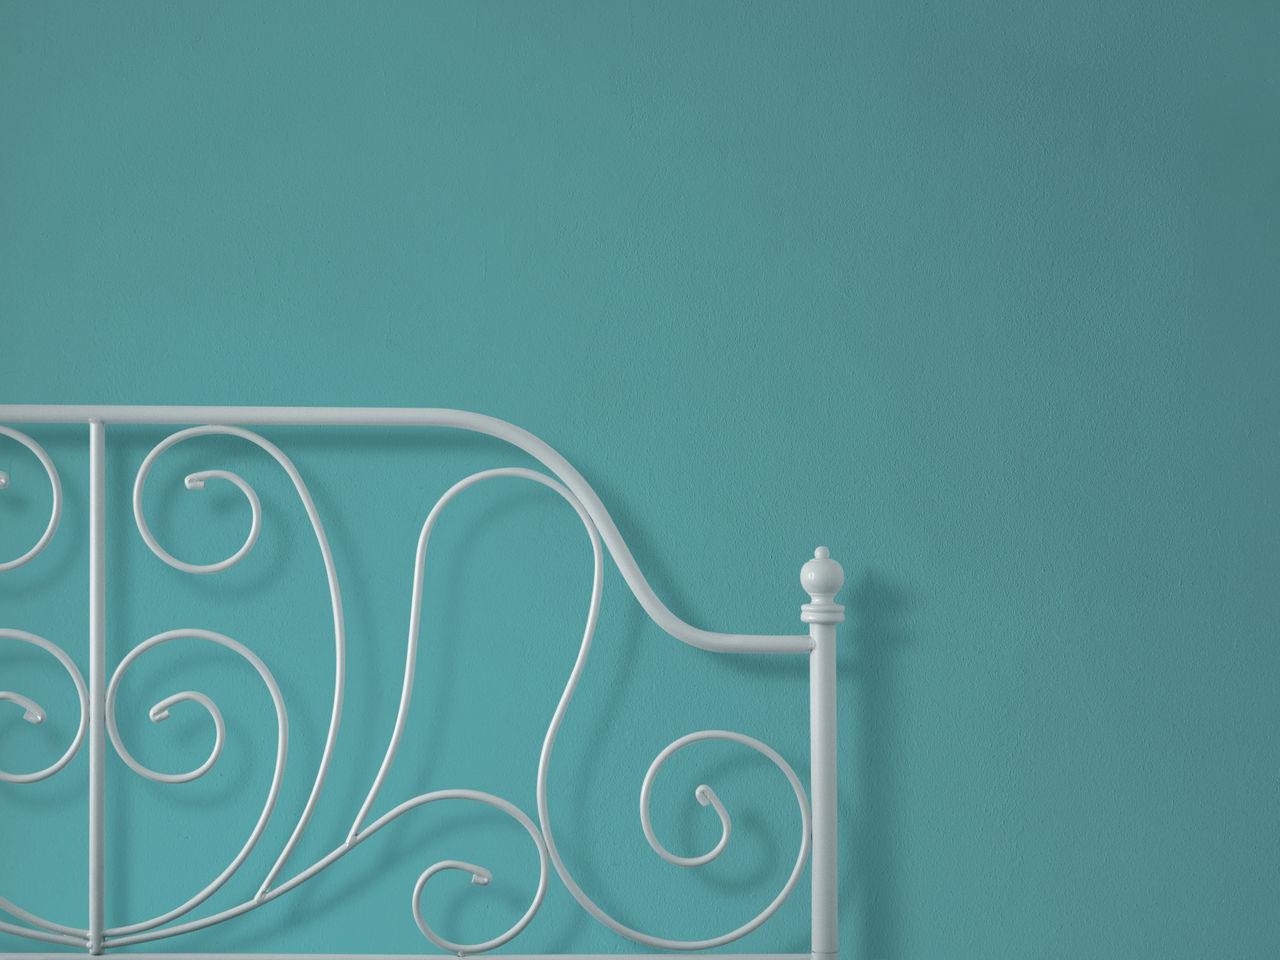 bedtime story~ Bed Bedding Bedhead Bedroom Bedtime Interior Pastel Pastel Colors Room Sleep Slumber Tiffany Blue  Wall